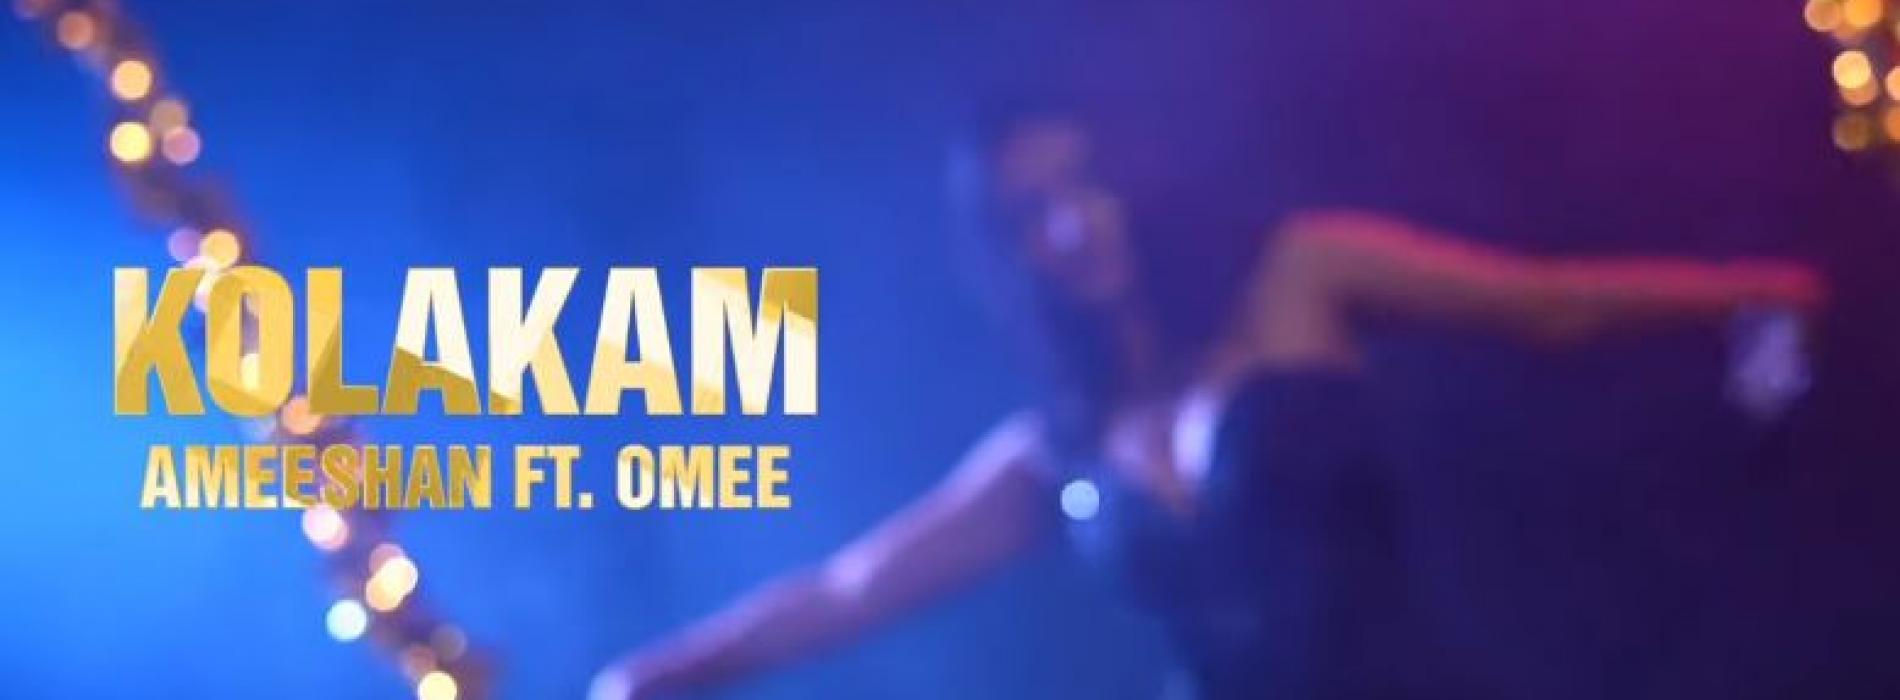 Kolakam – Ameeshan Ft Omee